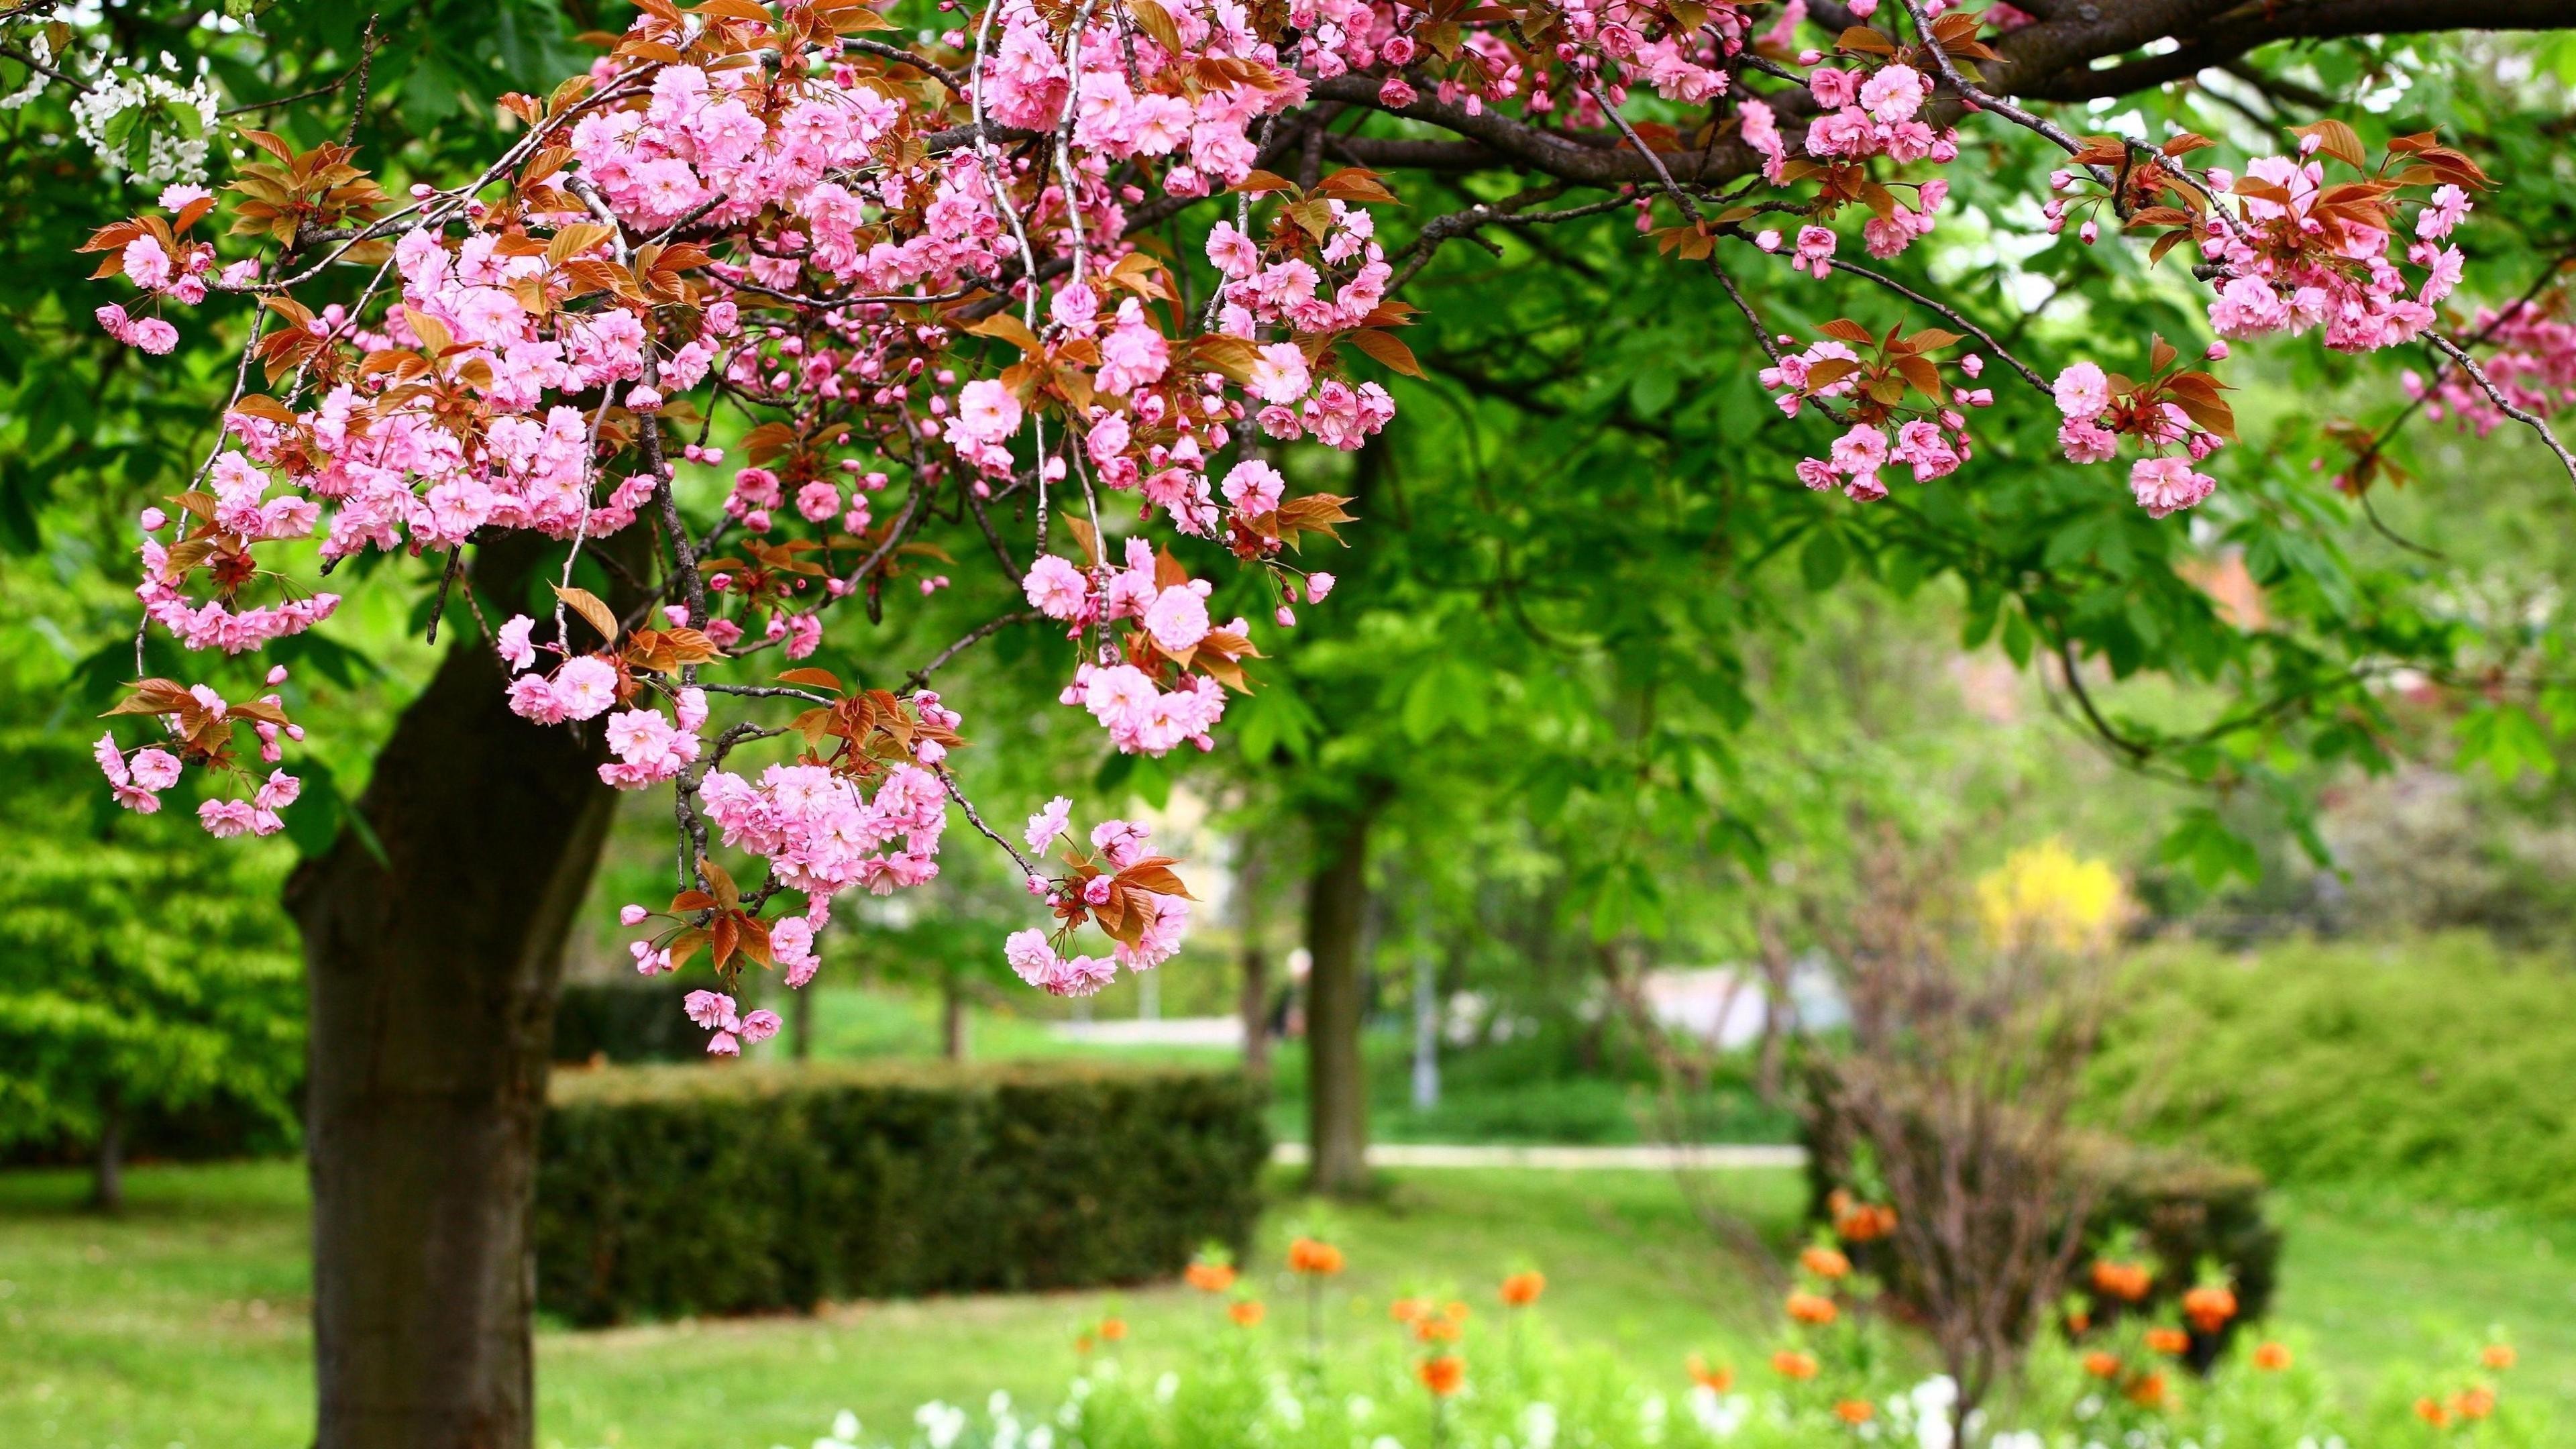 3840x2160 Sakura Bloom Spring 4k Wallpaper Hd Flowers 4k